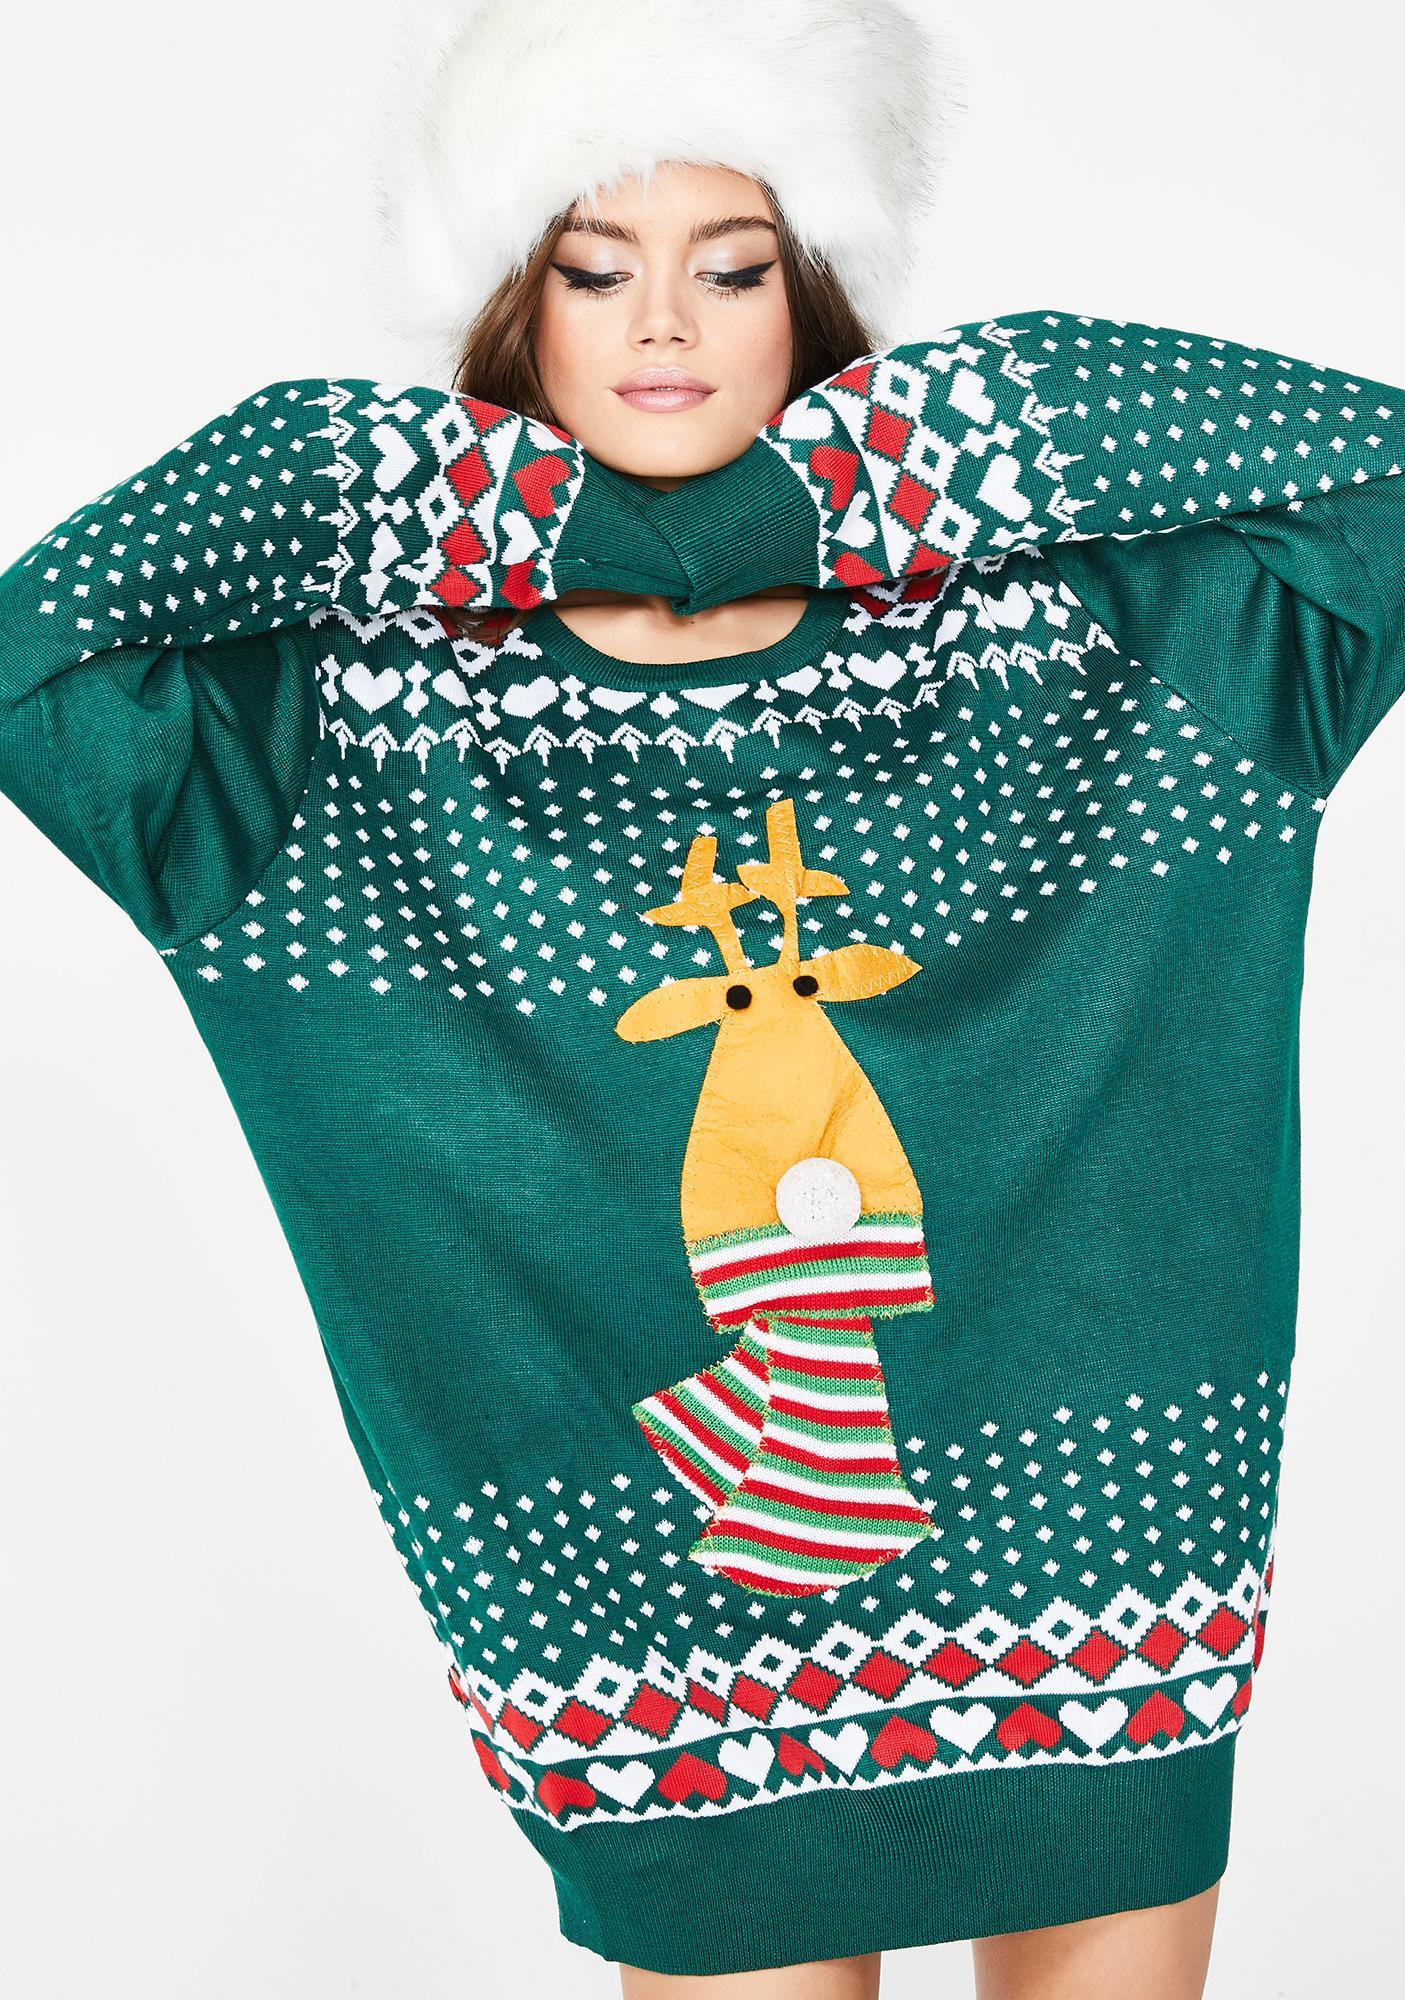 Rudolph's So Lit Light Up Sweater